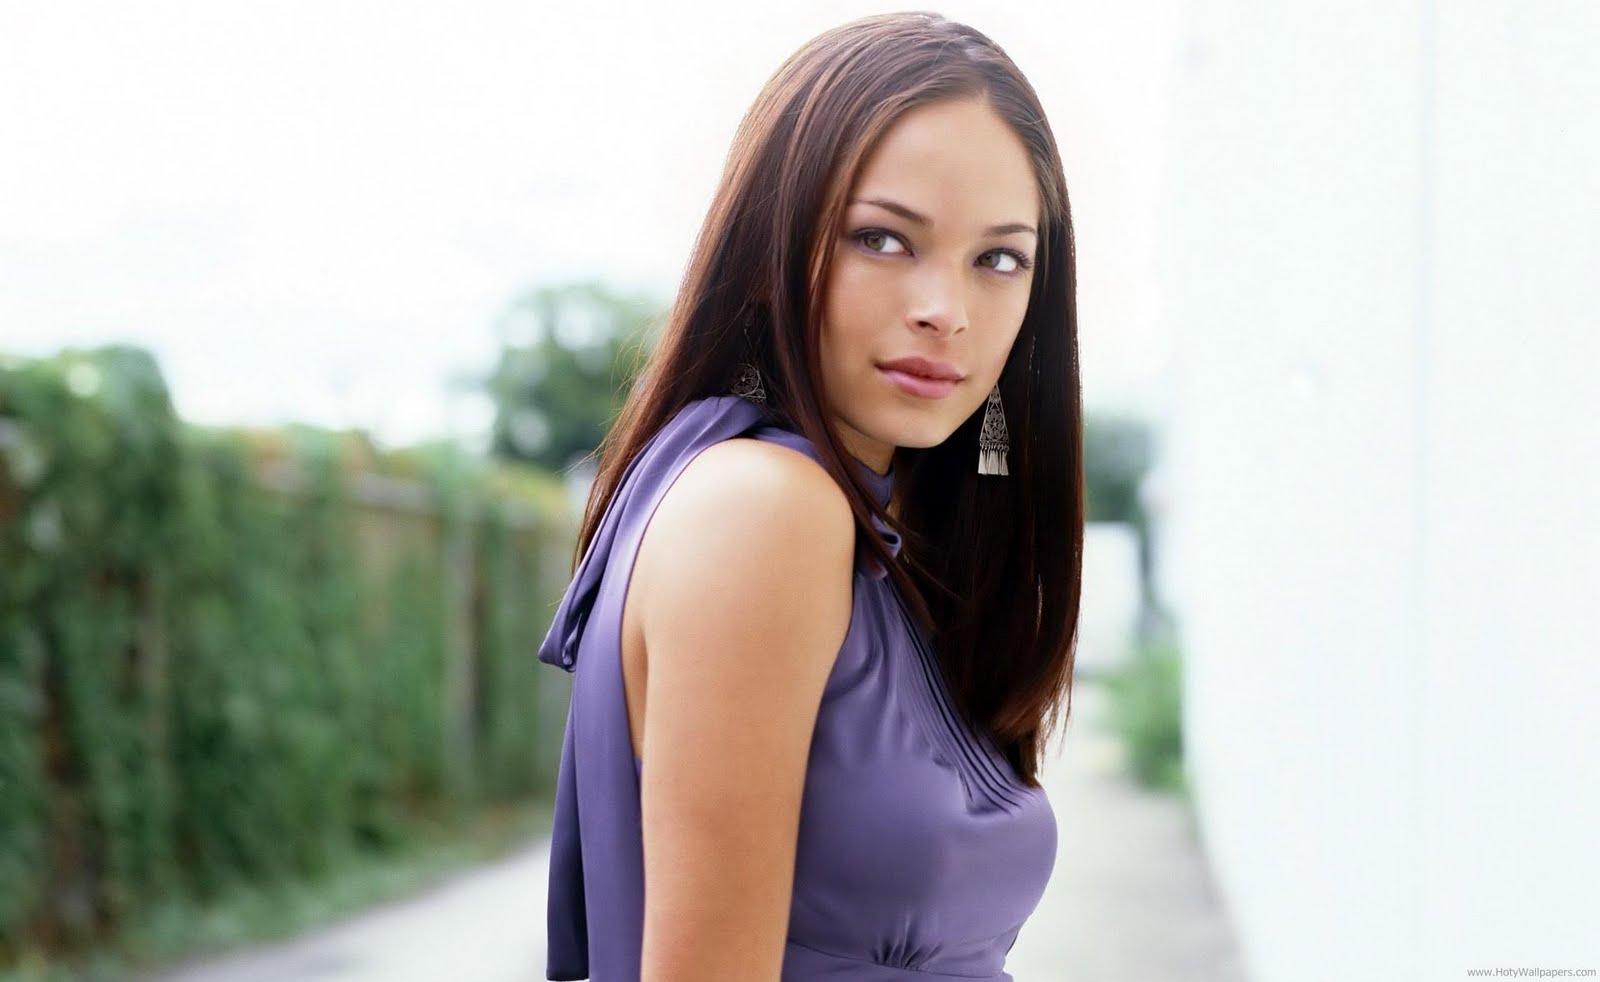 http://3.bp.blogspot.com/-xvYdsFzSqro/TqbSnvC0nWI/AAAAAAAANb0/yA-Zxhg4DHI/s1600/actress_kristin_kreuk_wallpaper.jpg